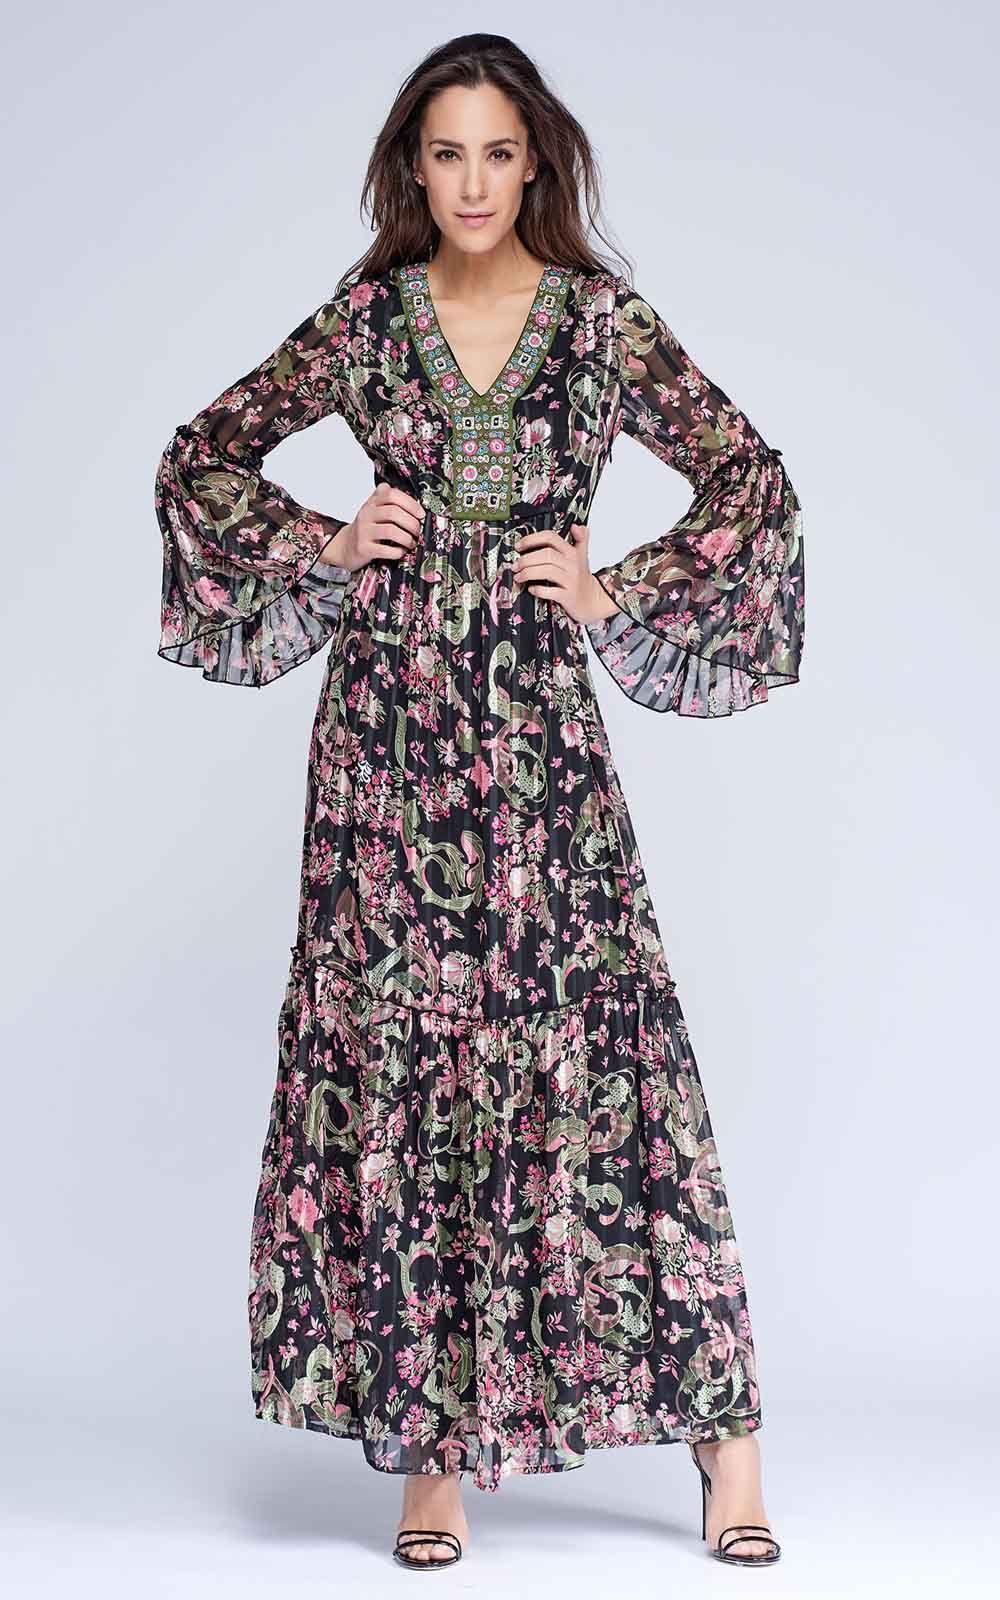 e4fa617b6  VestidoNiza largo estampado floral en gasa con raya satén. Escote bordado  en V.